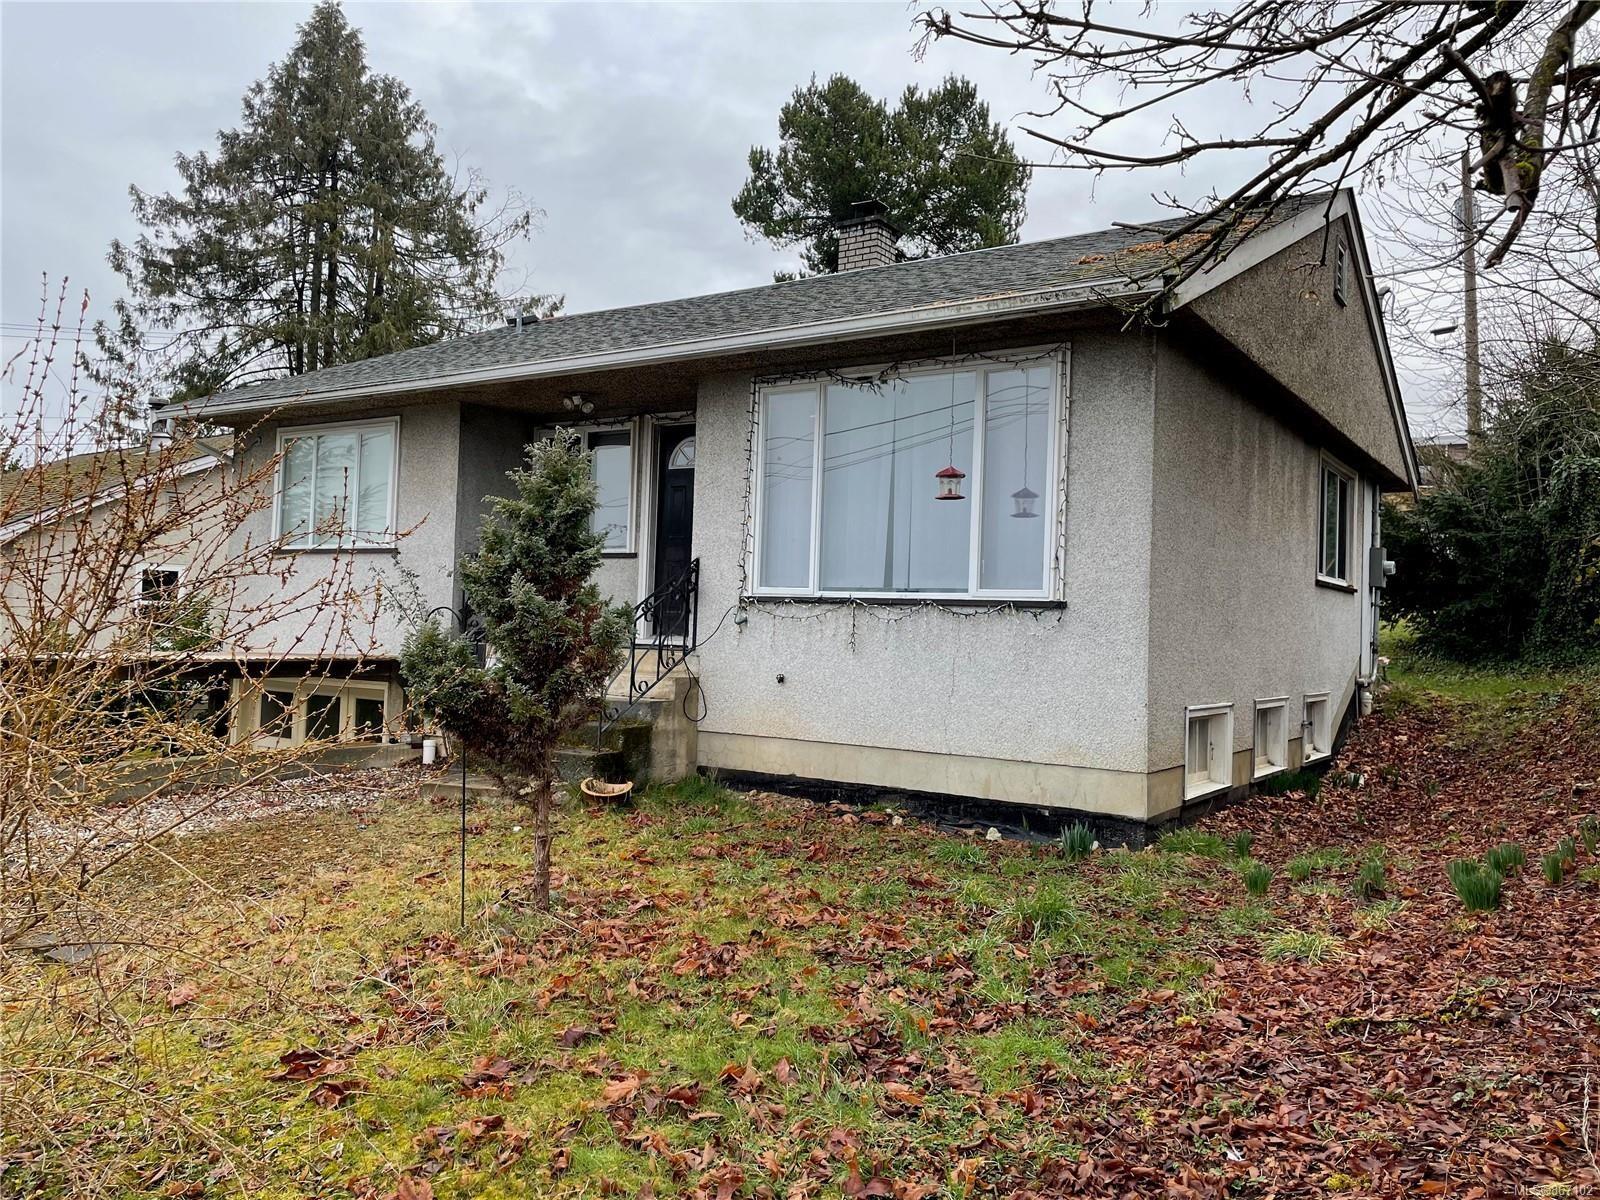 Main Photo: 3543 7th Ave in : PA Alberni Valley House for sale (Port Alberni)  : MLS®# 867102